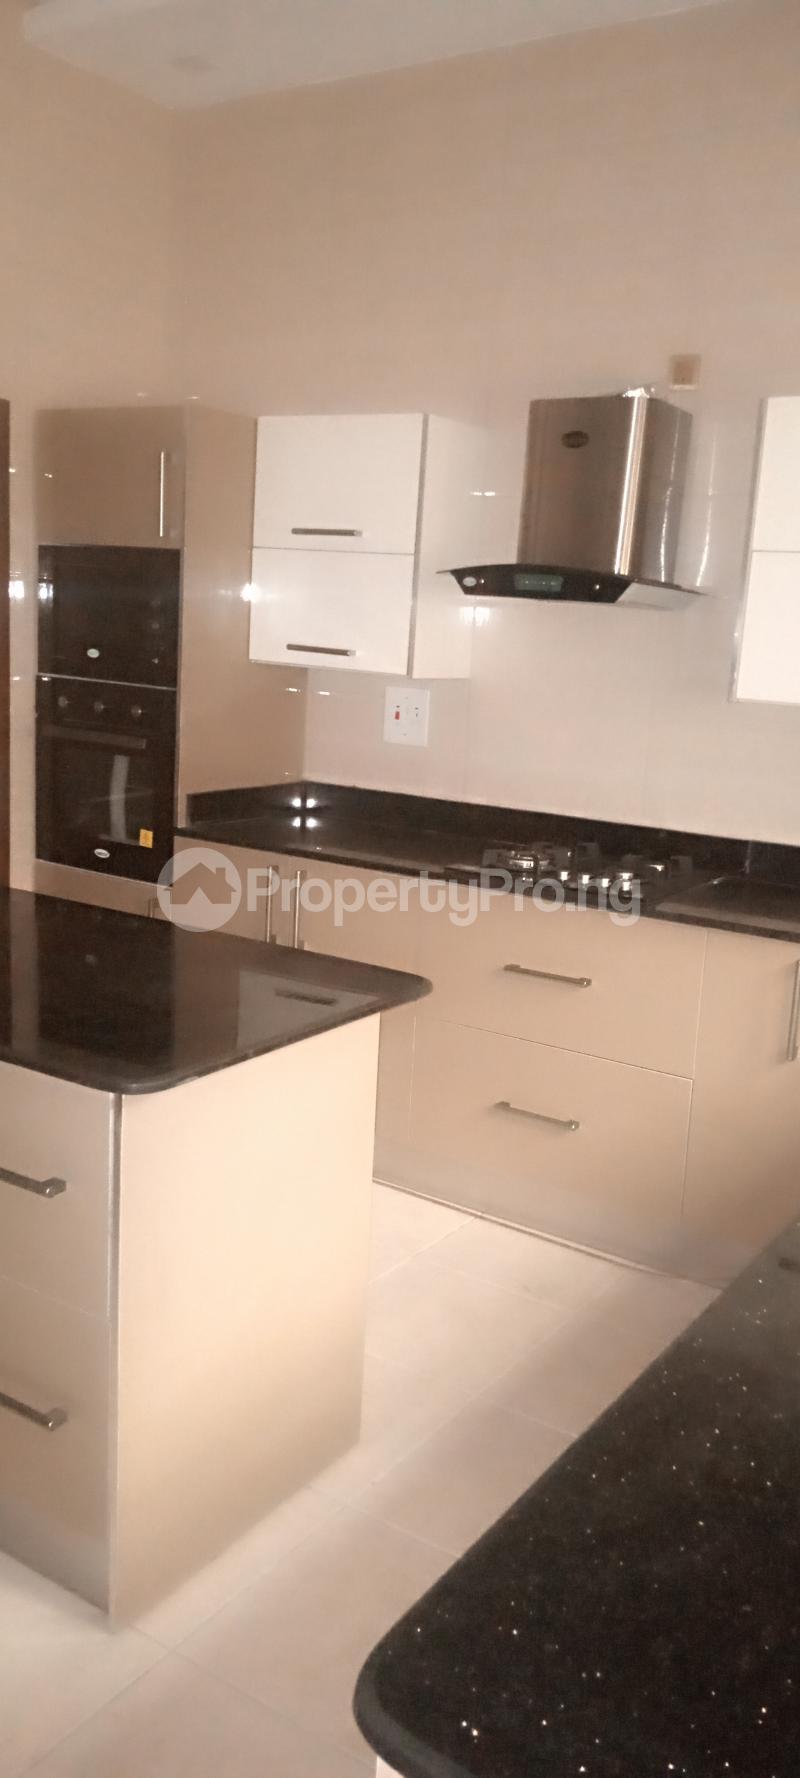 5 bedroom Detached Duplex House for sale Estate drive Omole phase 1 Ojodu Lagos - 5